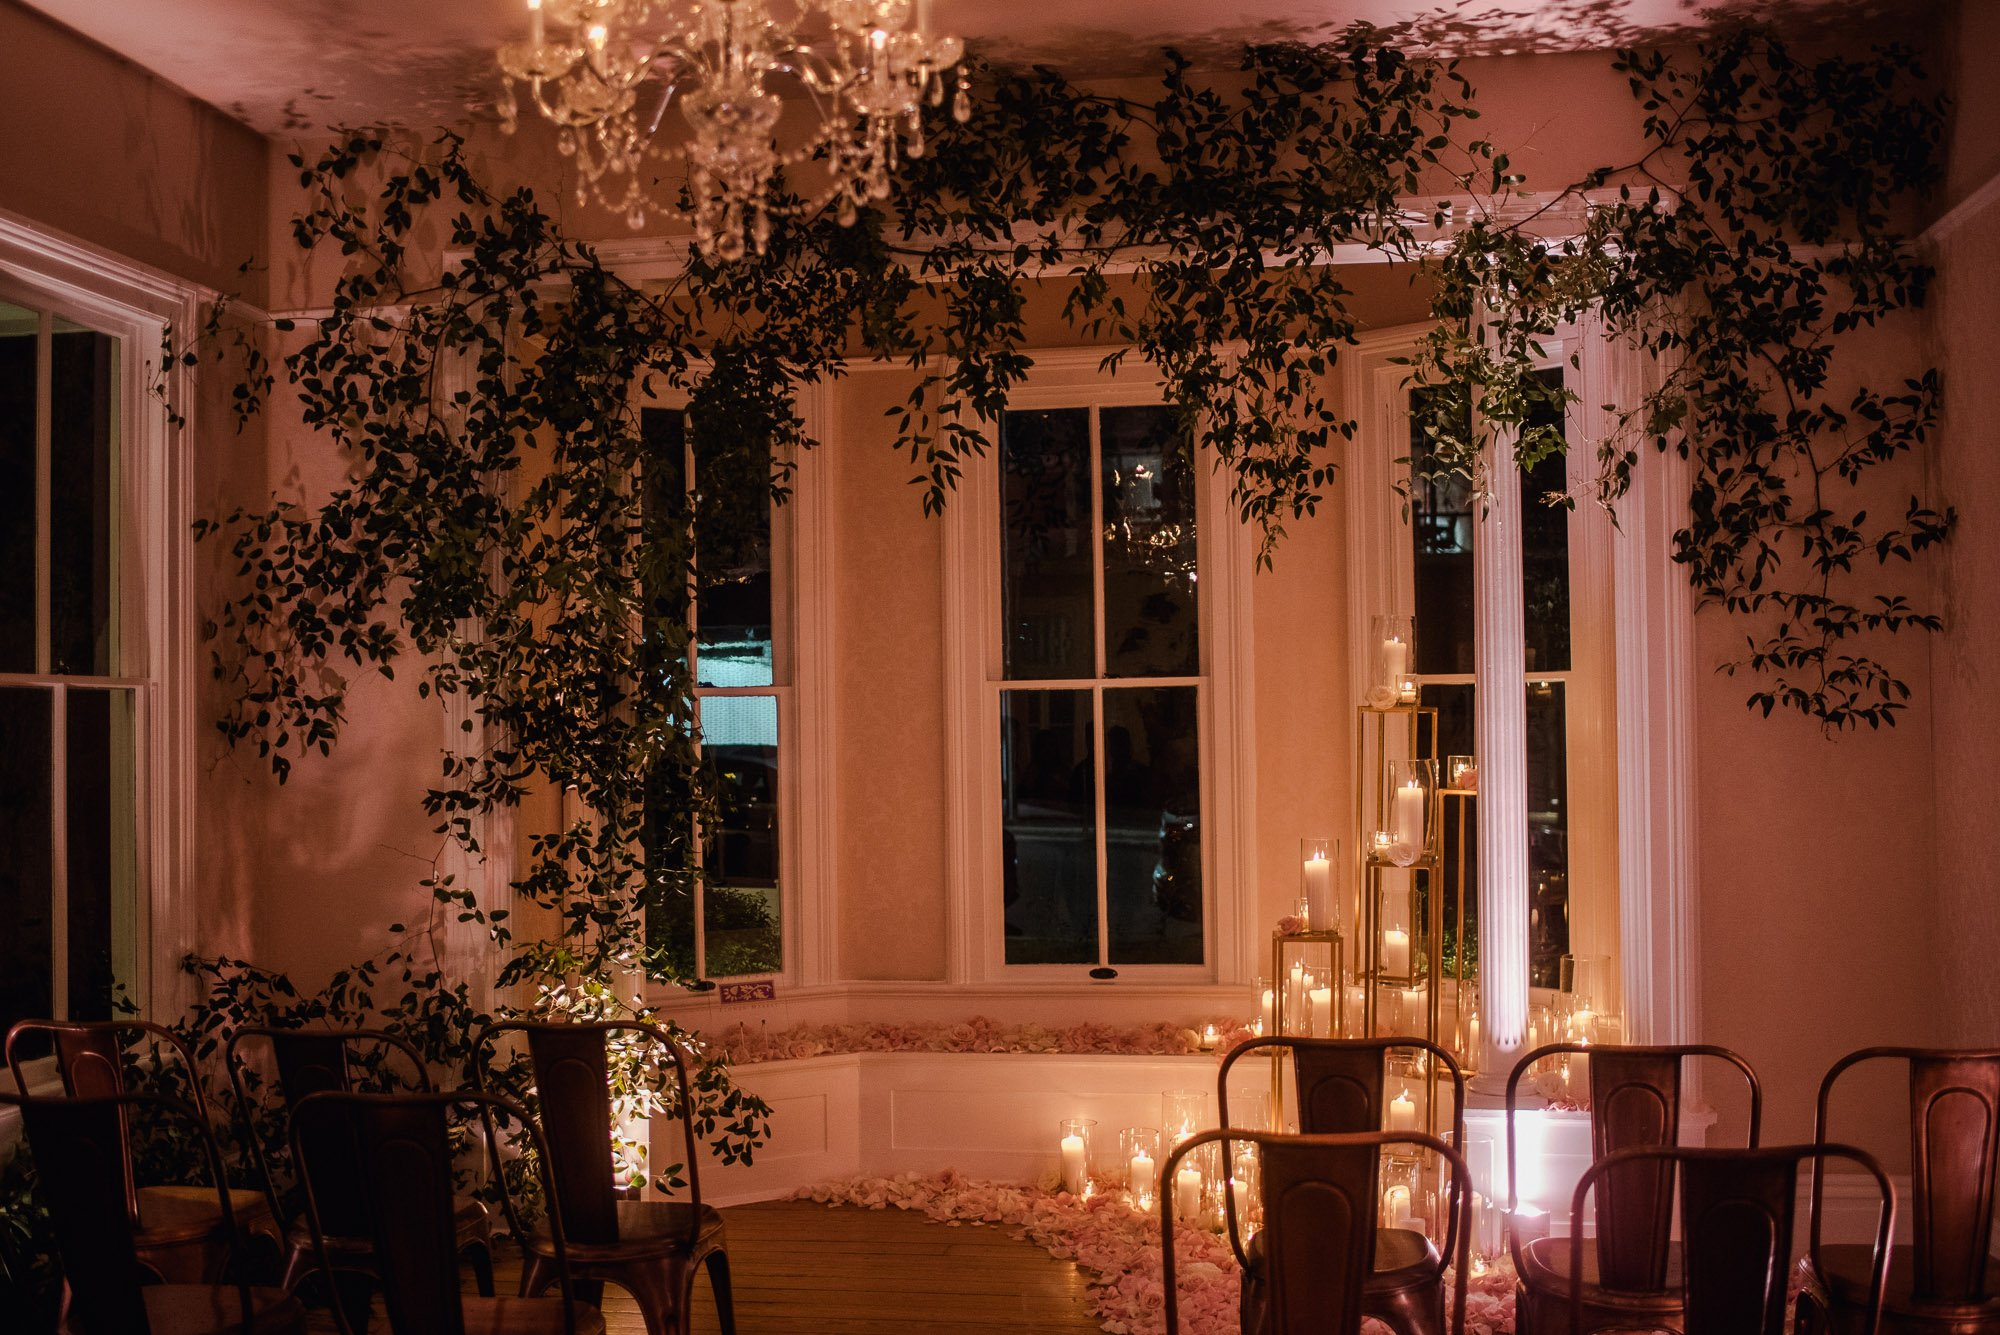 allan house interior night wedding